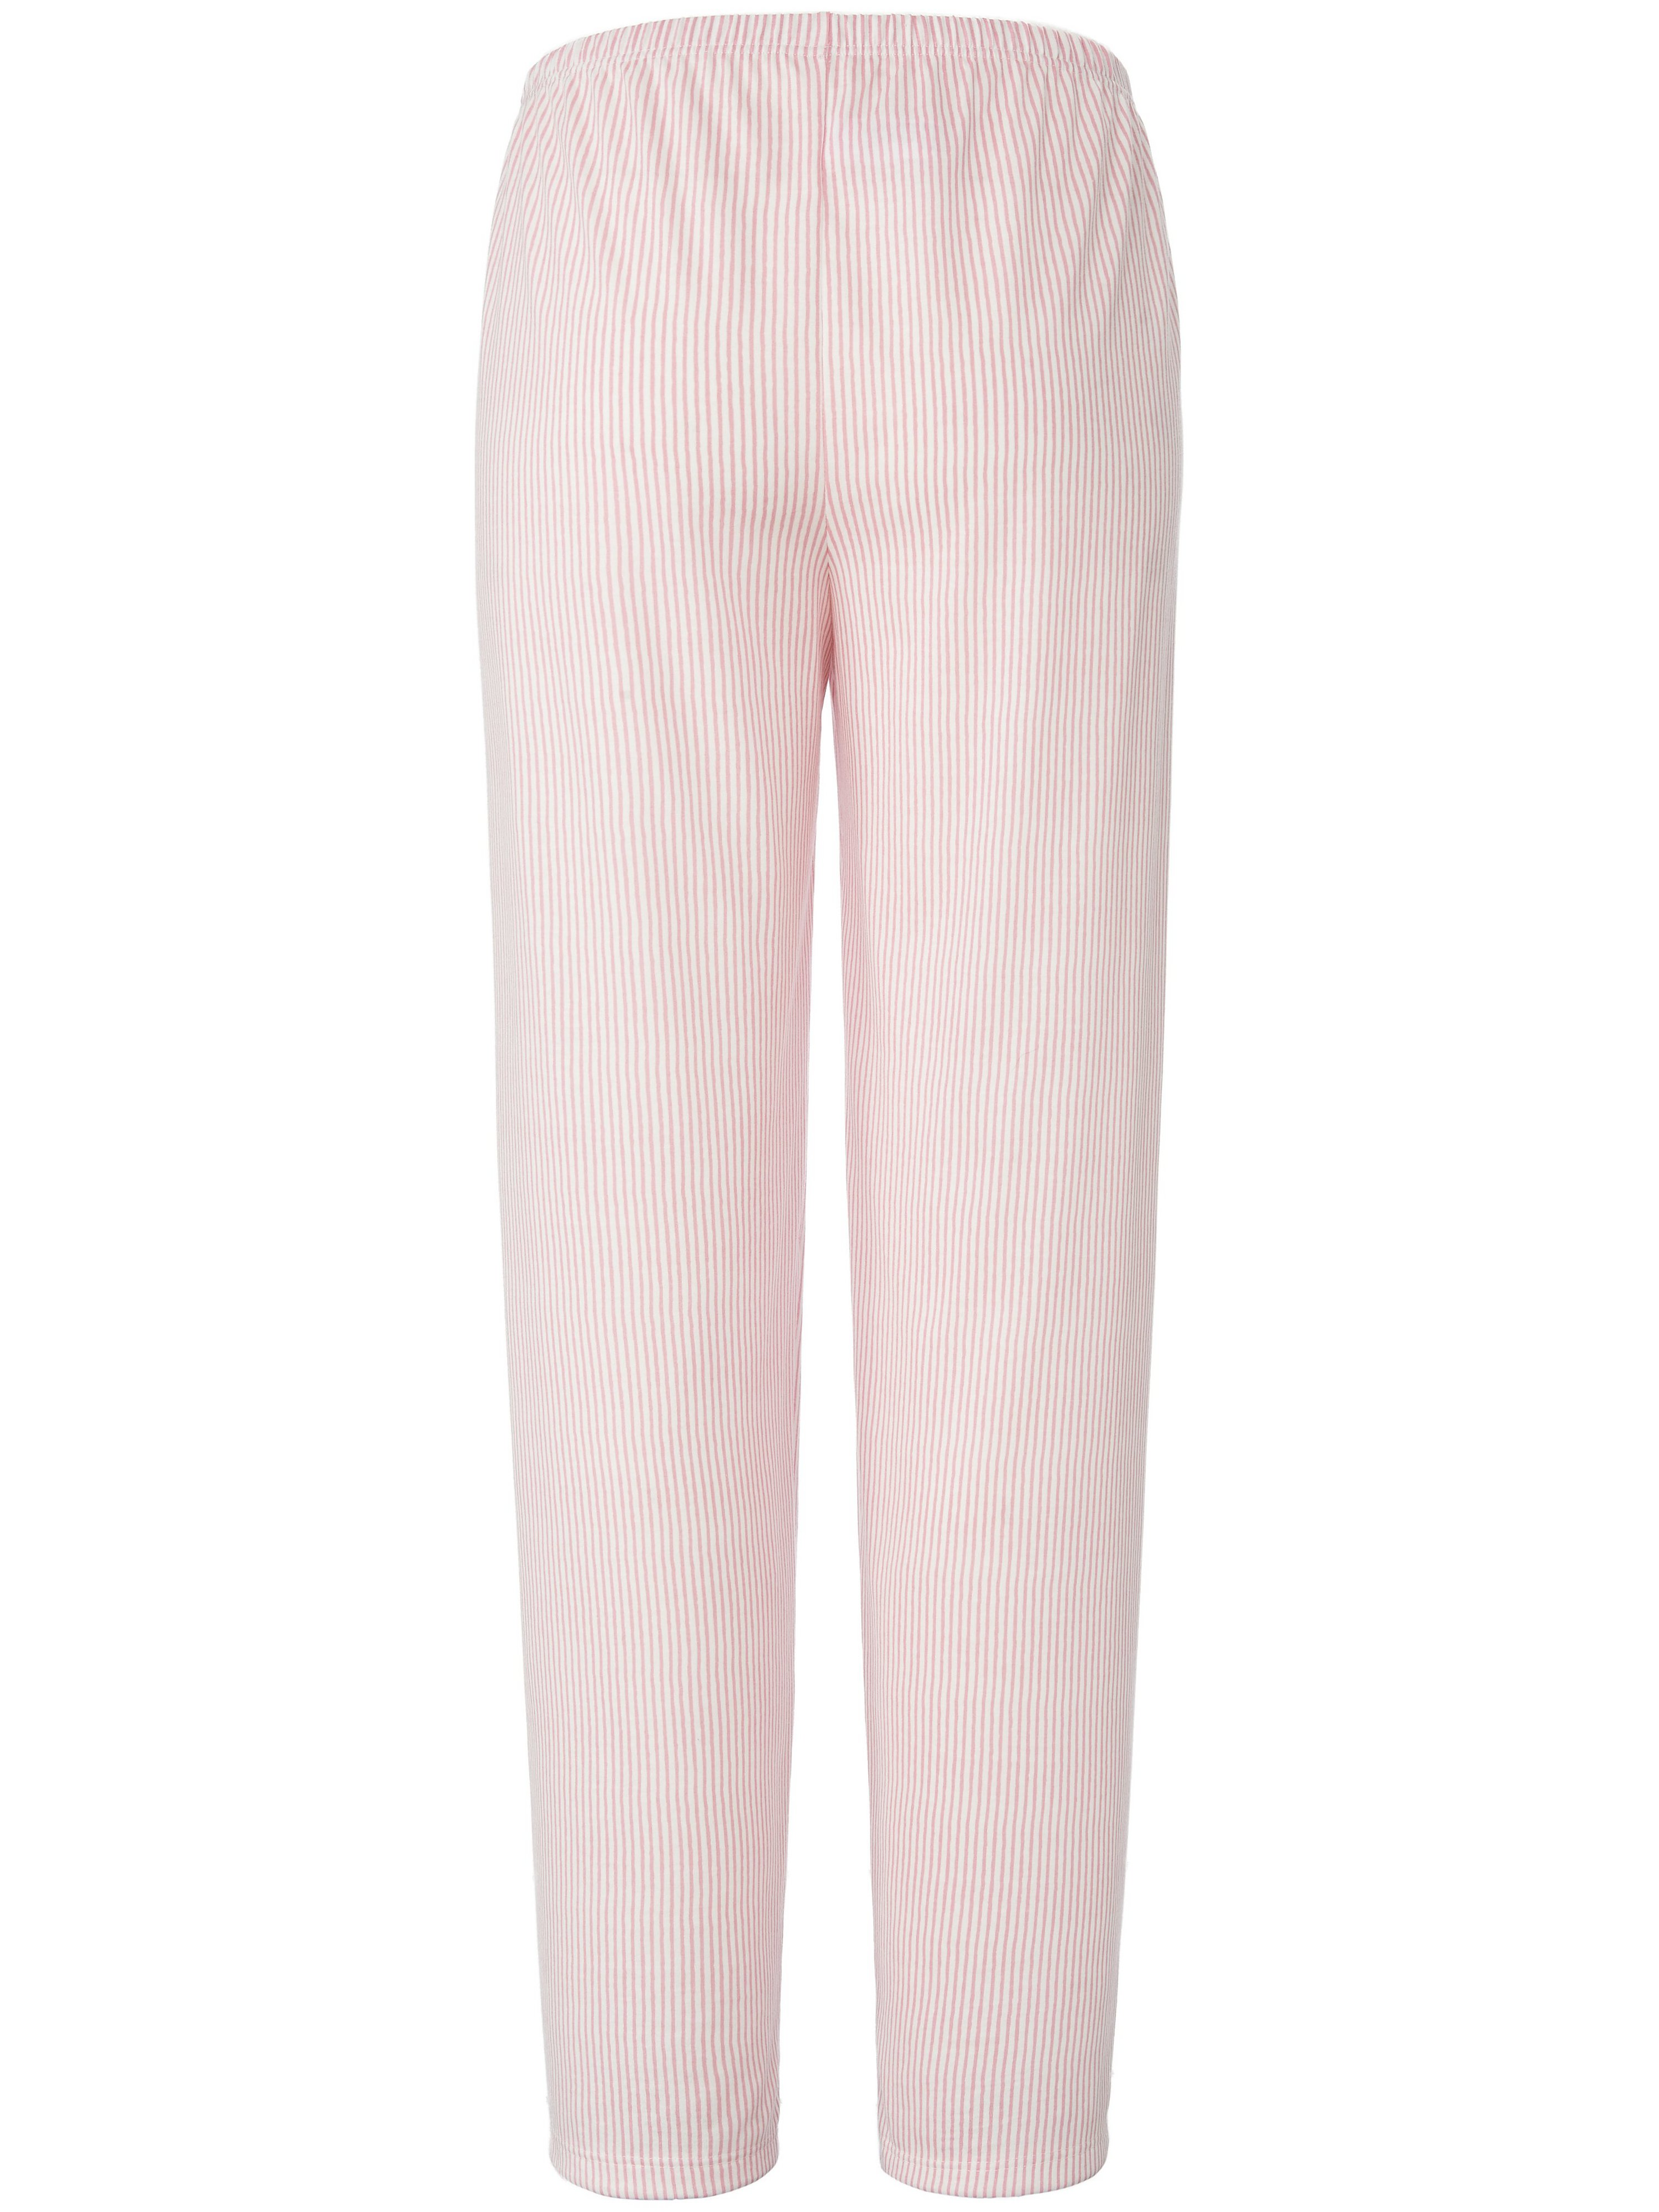 Lang pyjamasbuks 100 bomuld Fra PETER HAHN PURE EDITION hvid